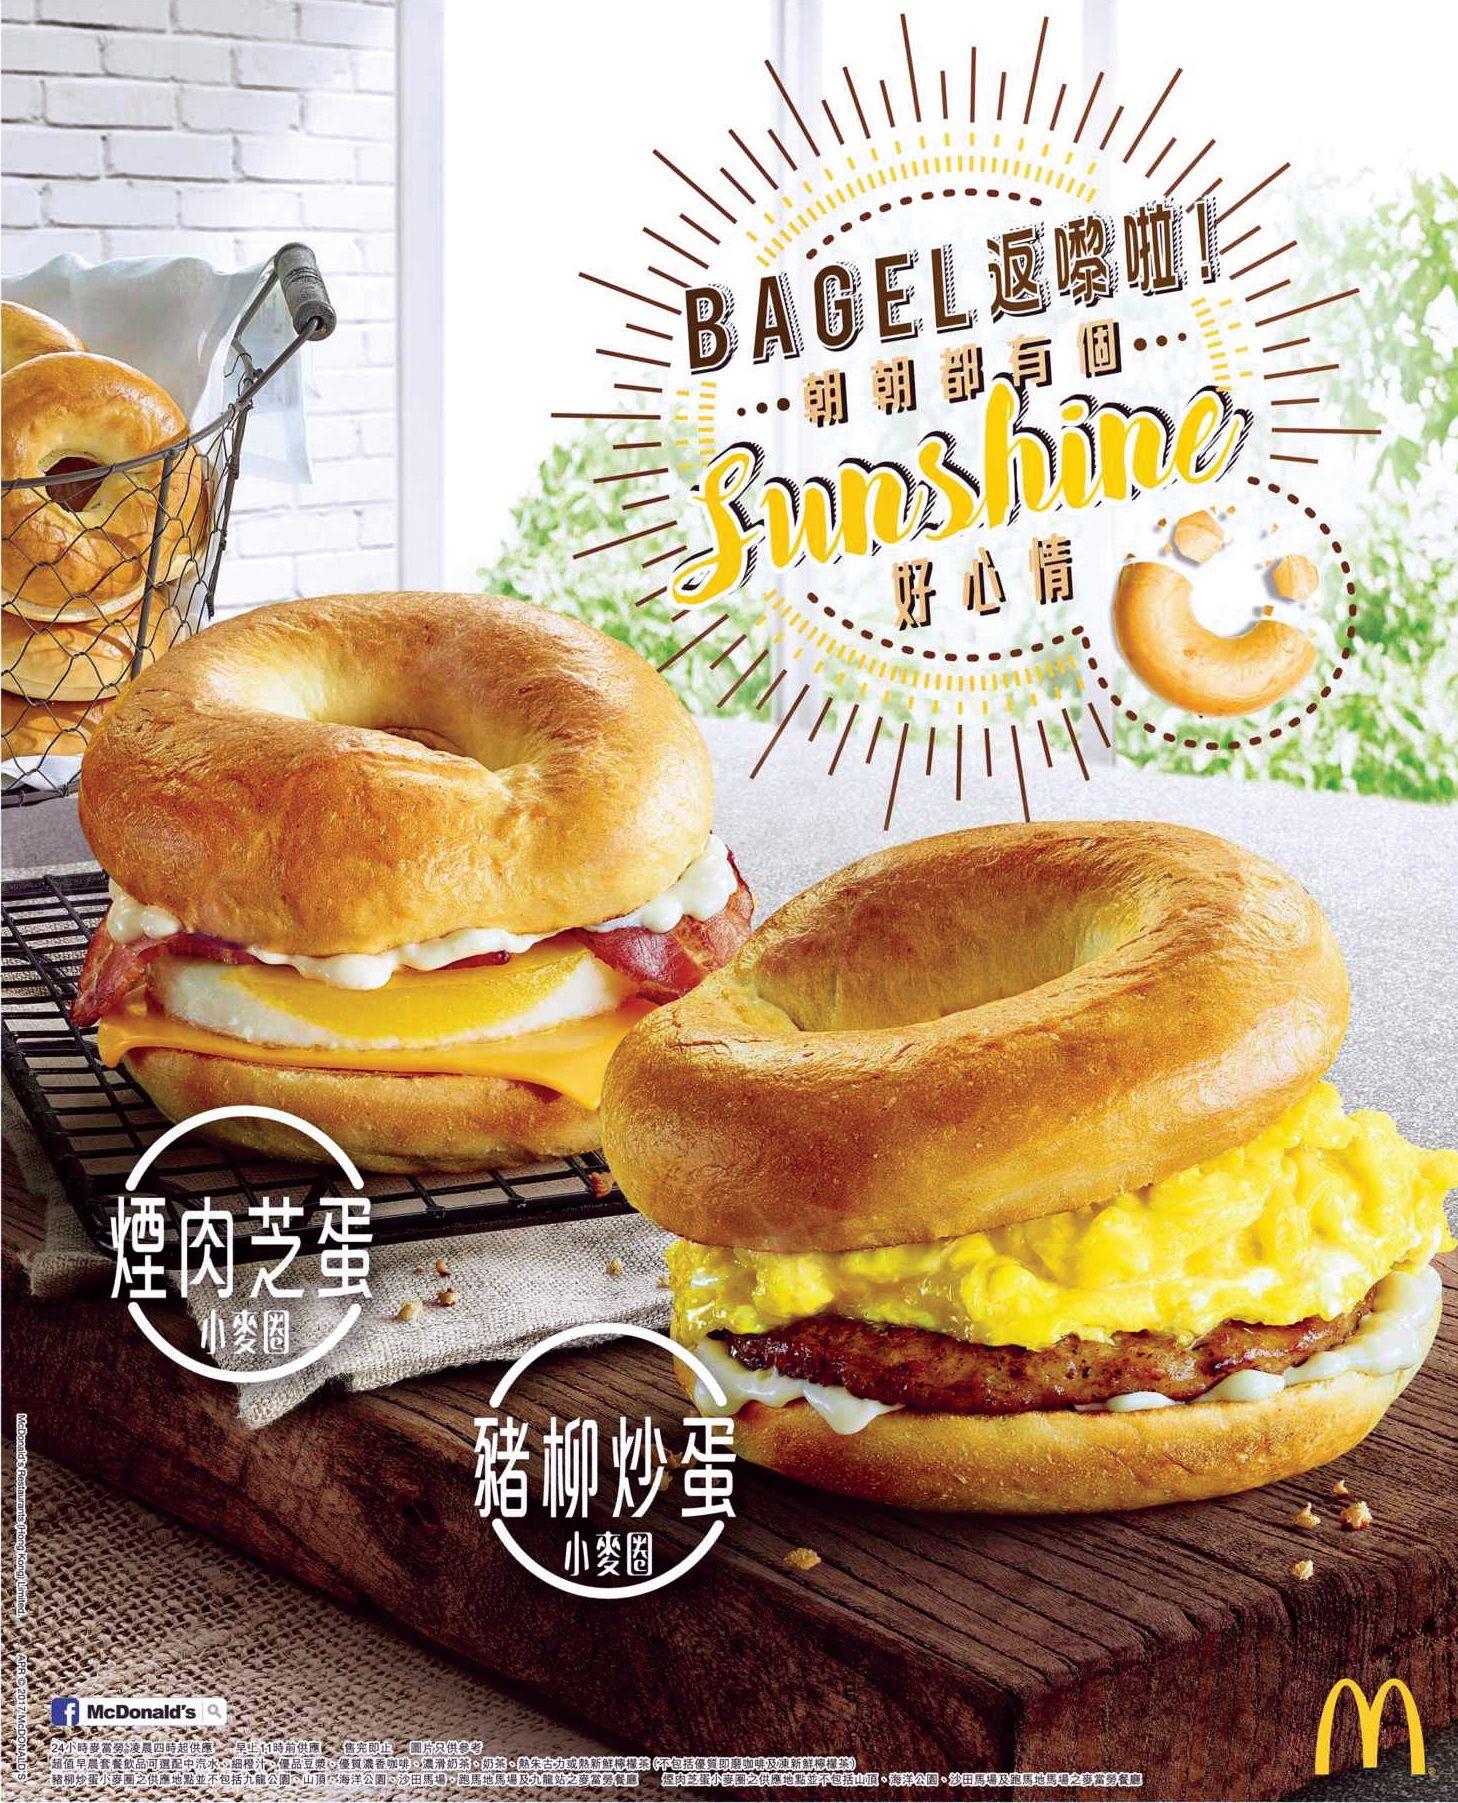 America's Top 10 Burger Toppings Burger toppings, Food